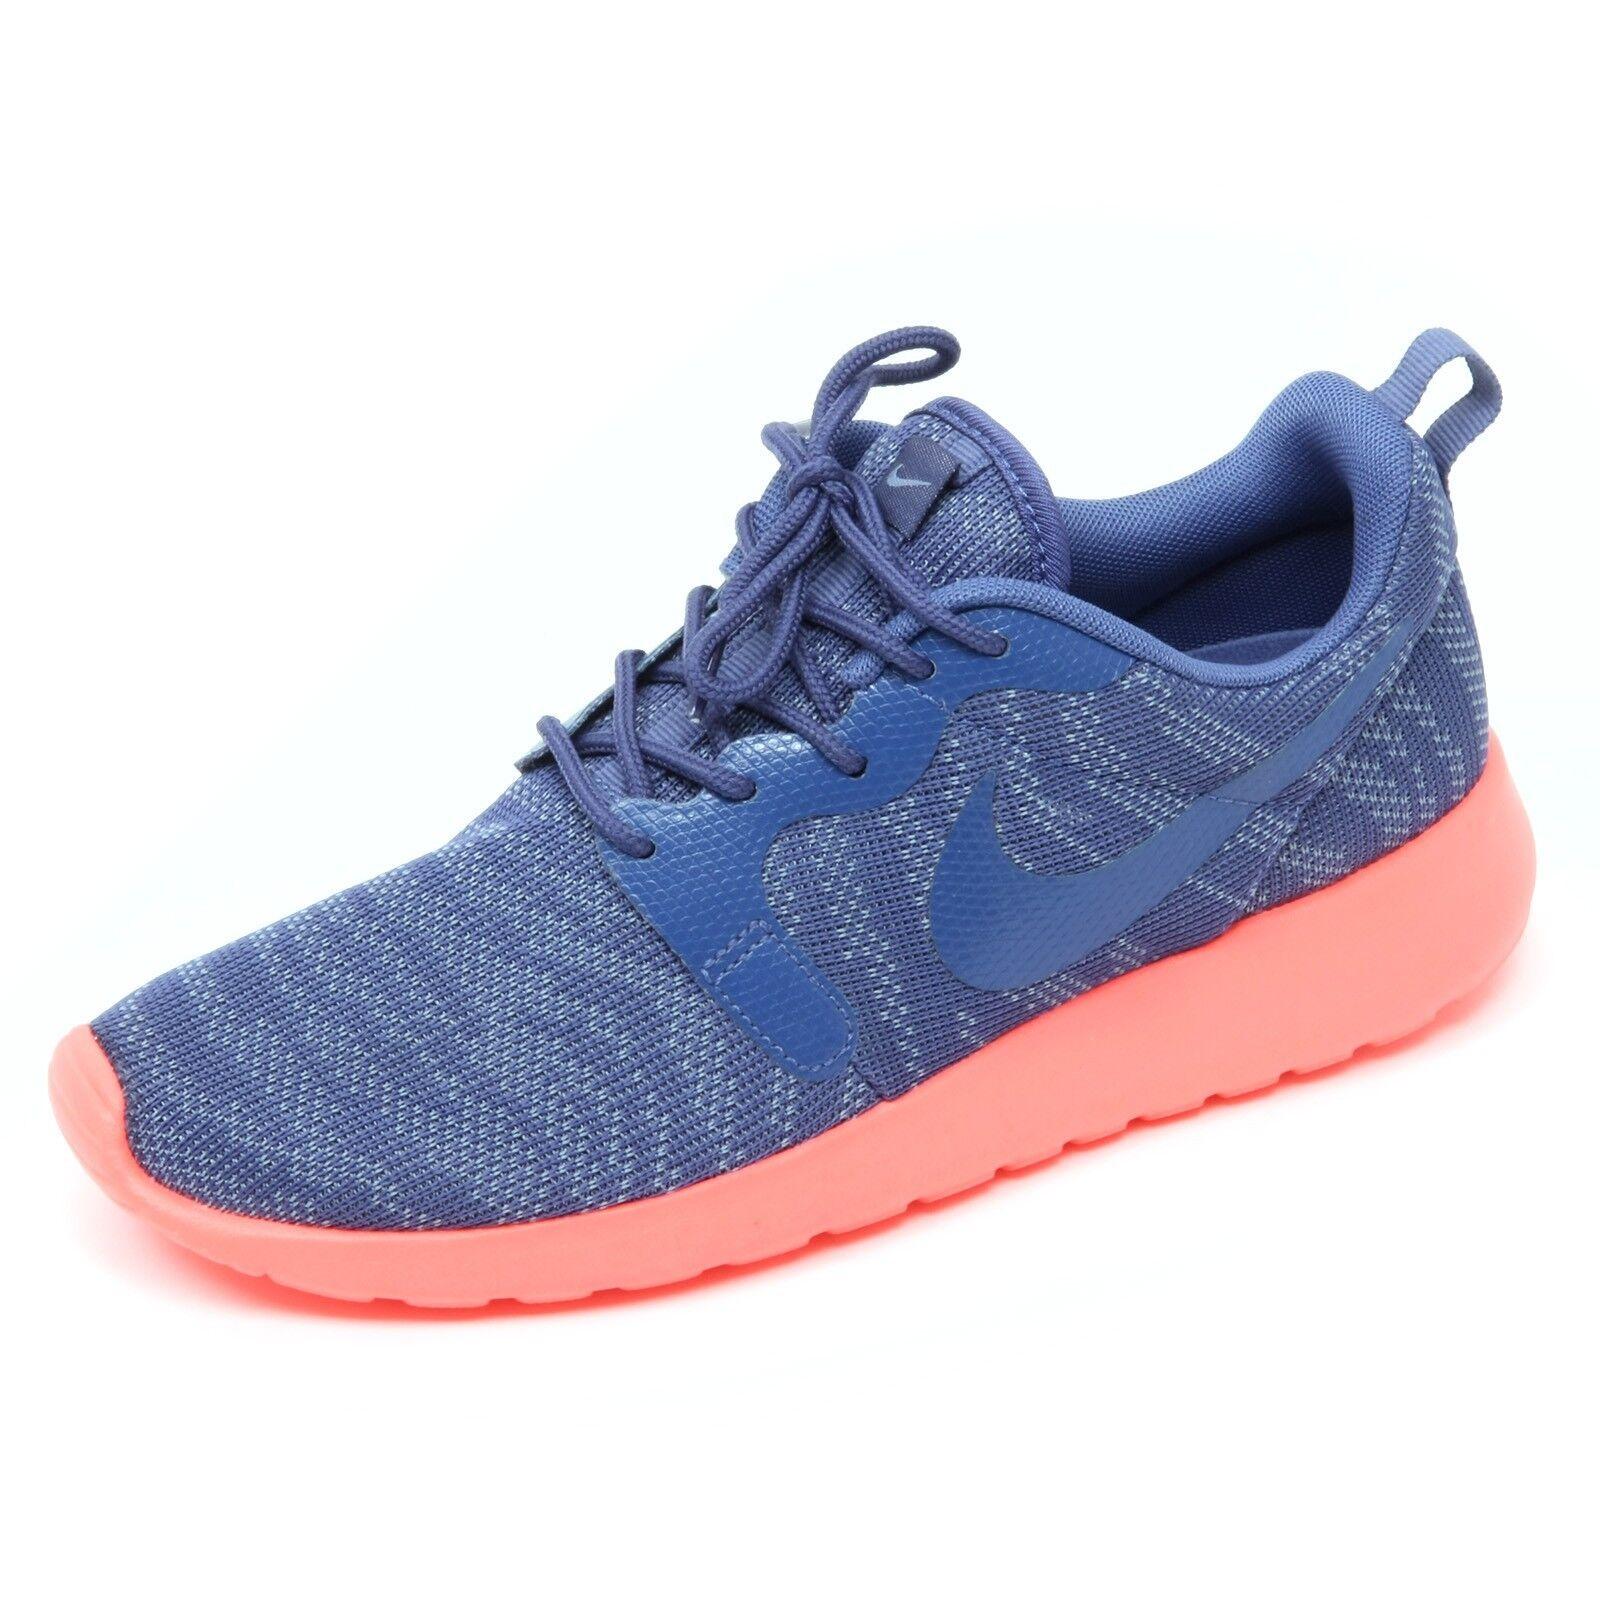 B8741 sneaker donna NIKE ROSHERUN ROSHERUN ROSHERUN KJCRD scarpa blu/corallo shoe woman | Prezzo Affare  | Uomini/Donne Scarpa  671816